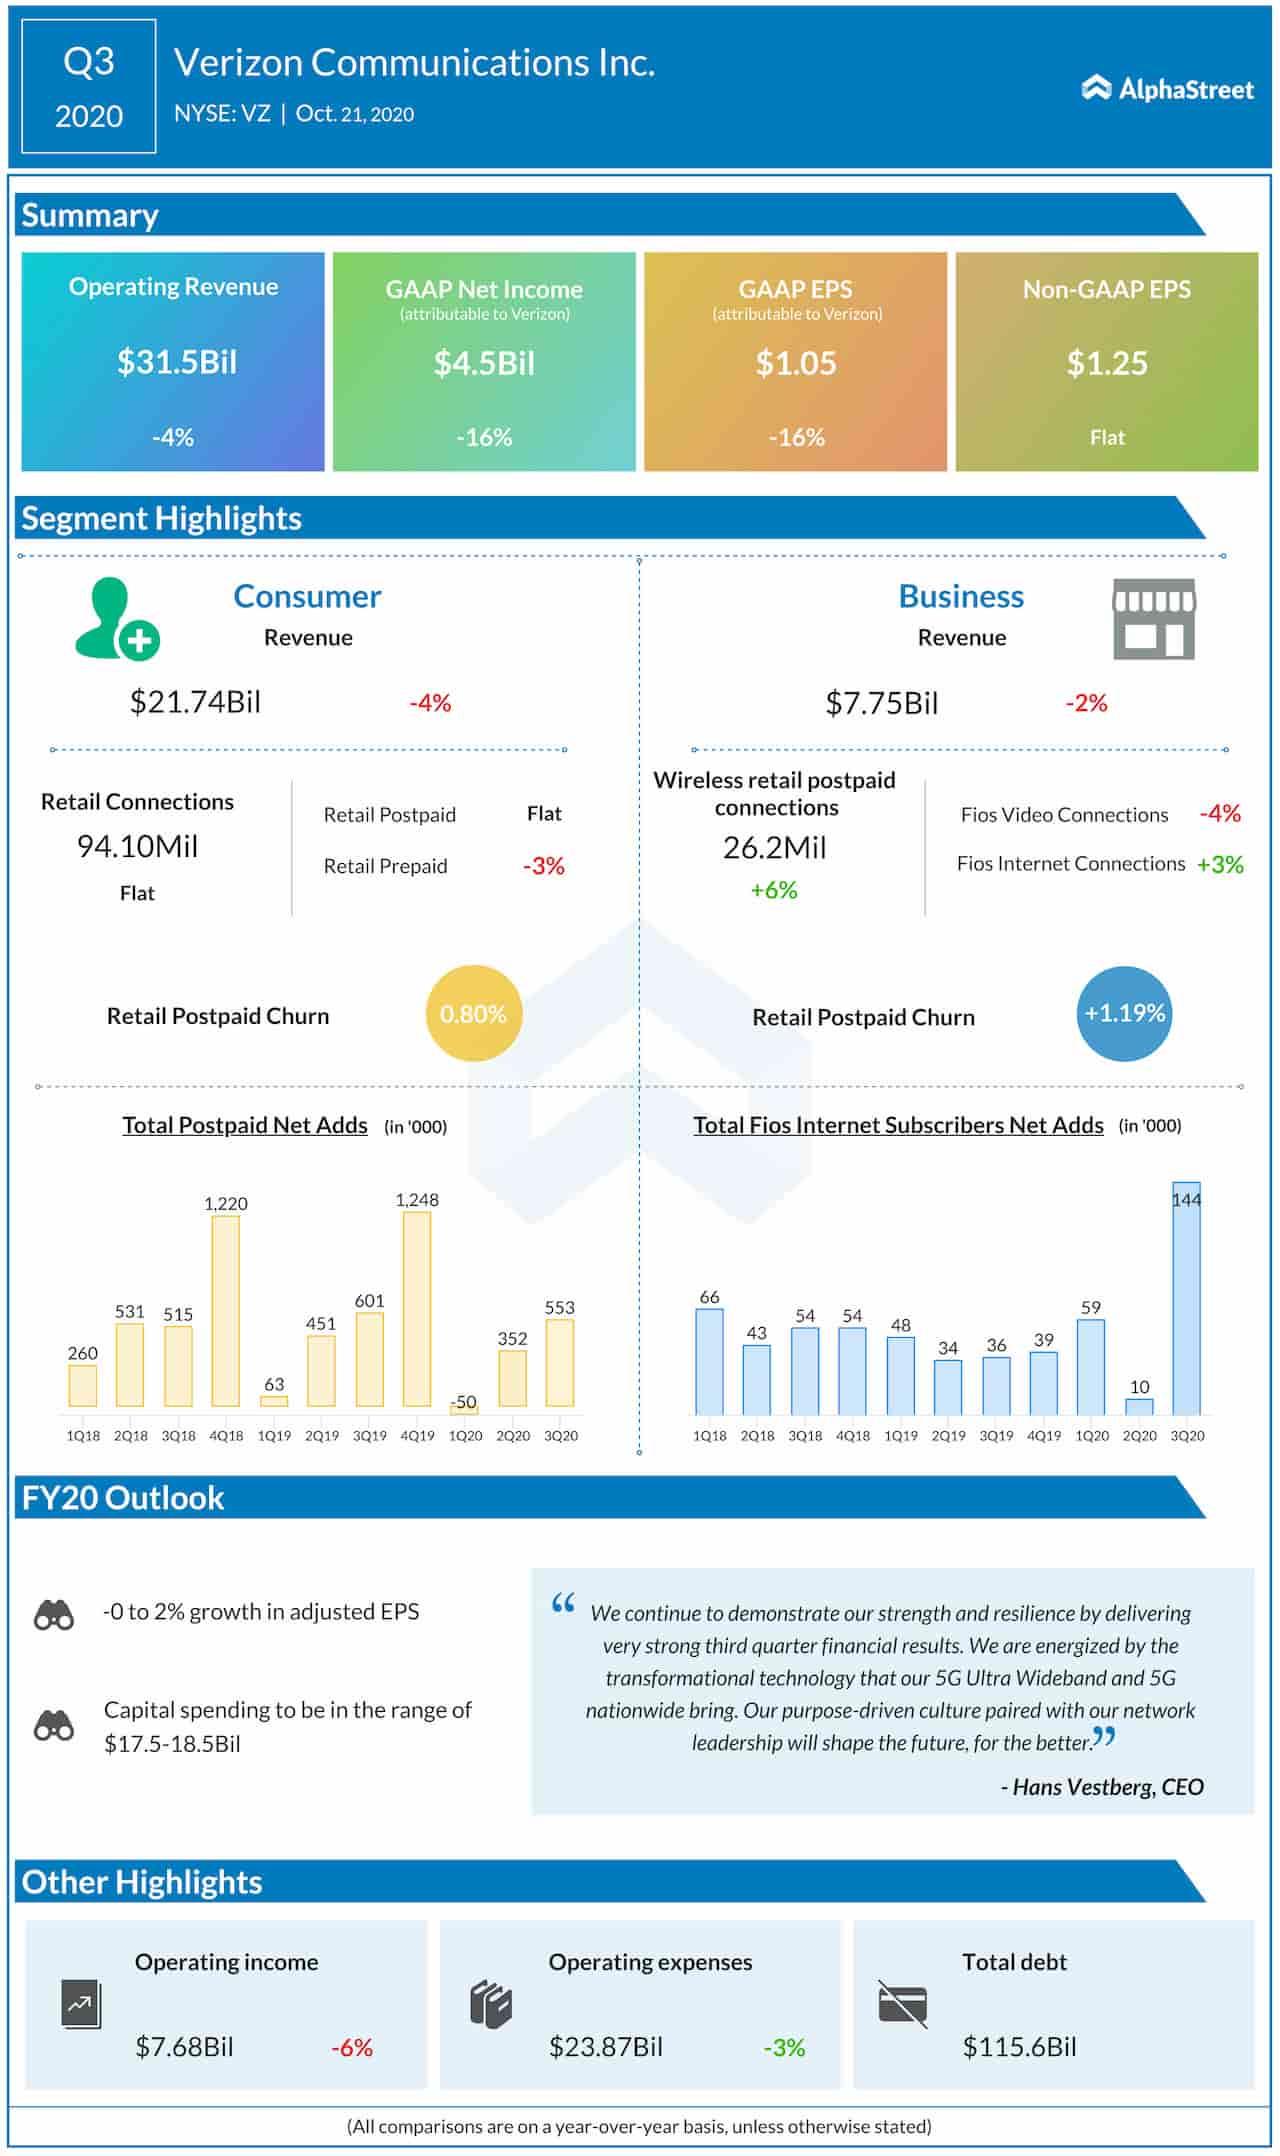 Verizon Q3 2020 Earnings Infographic